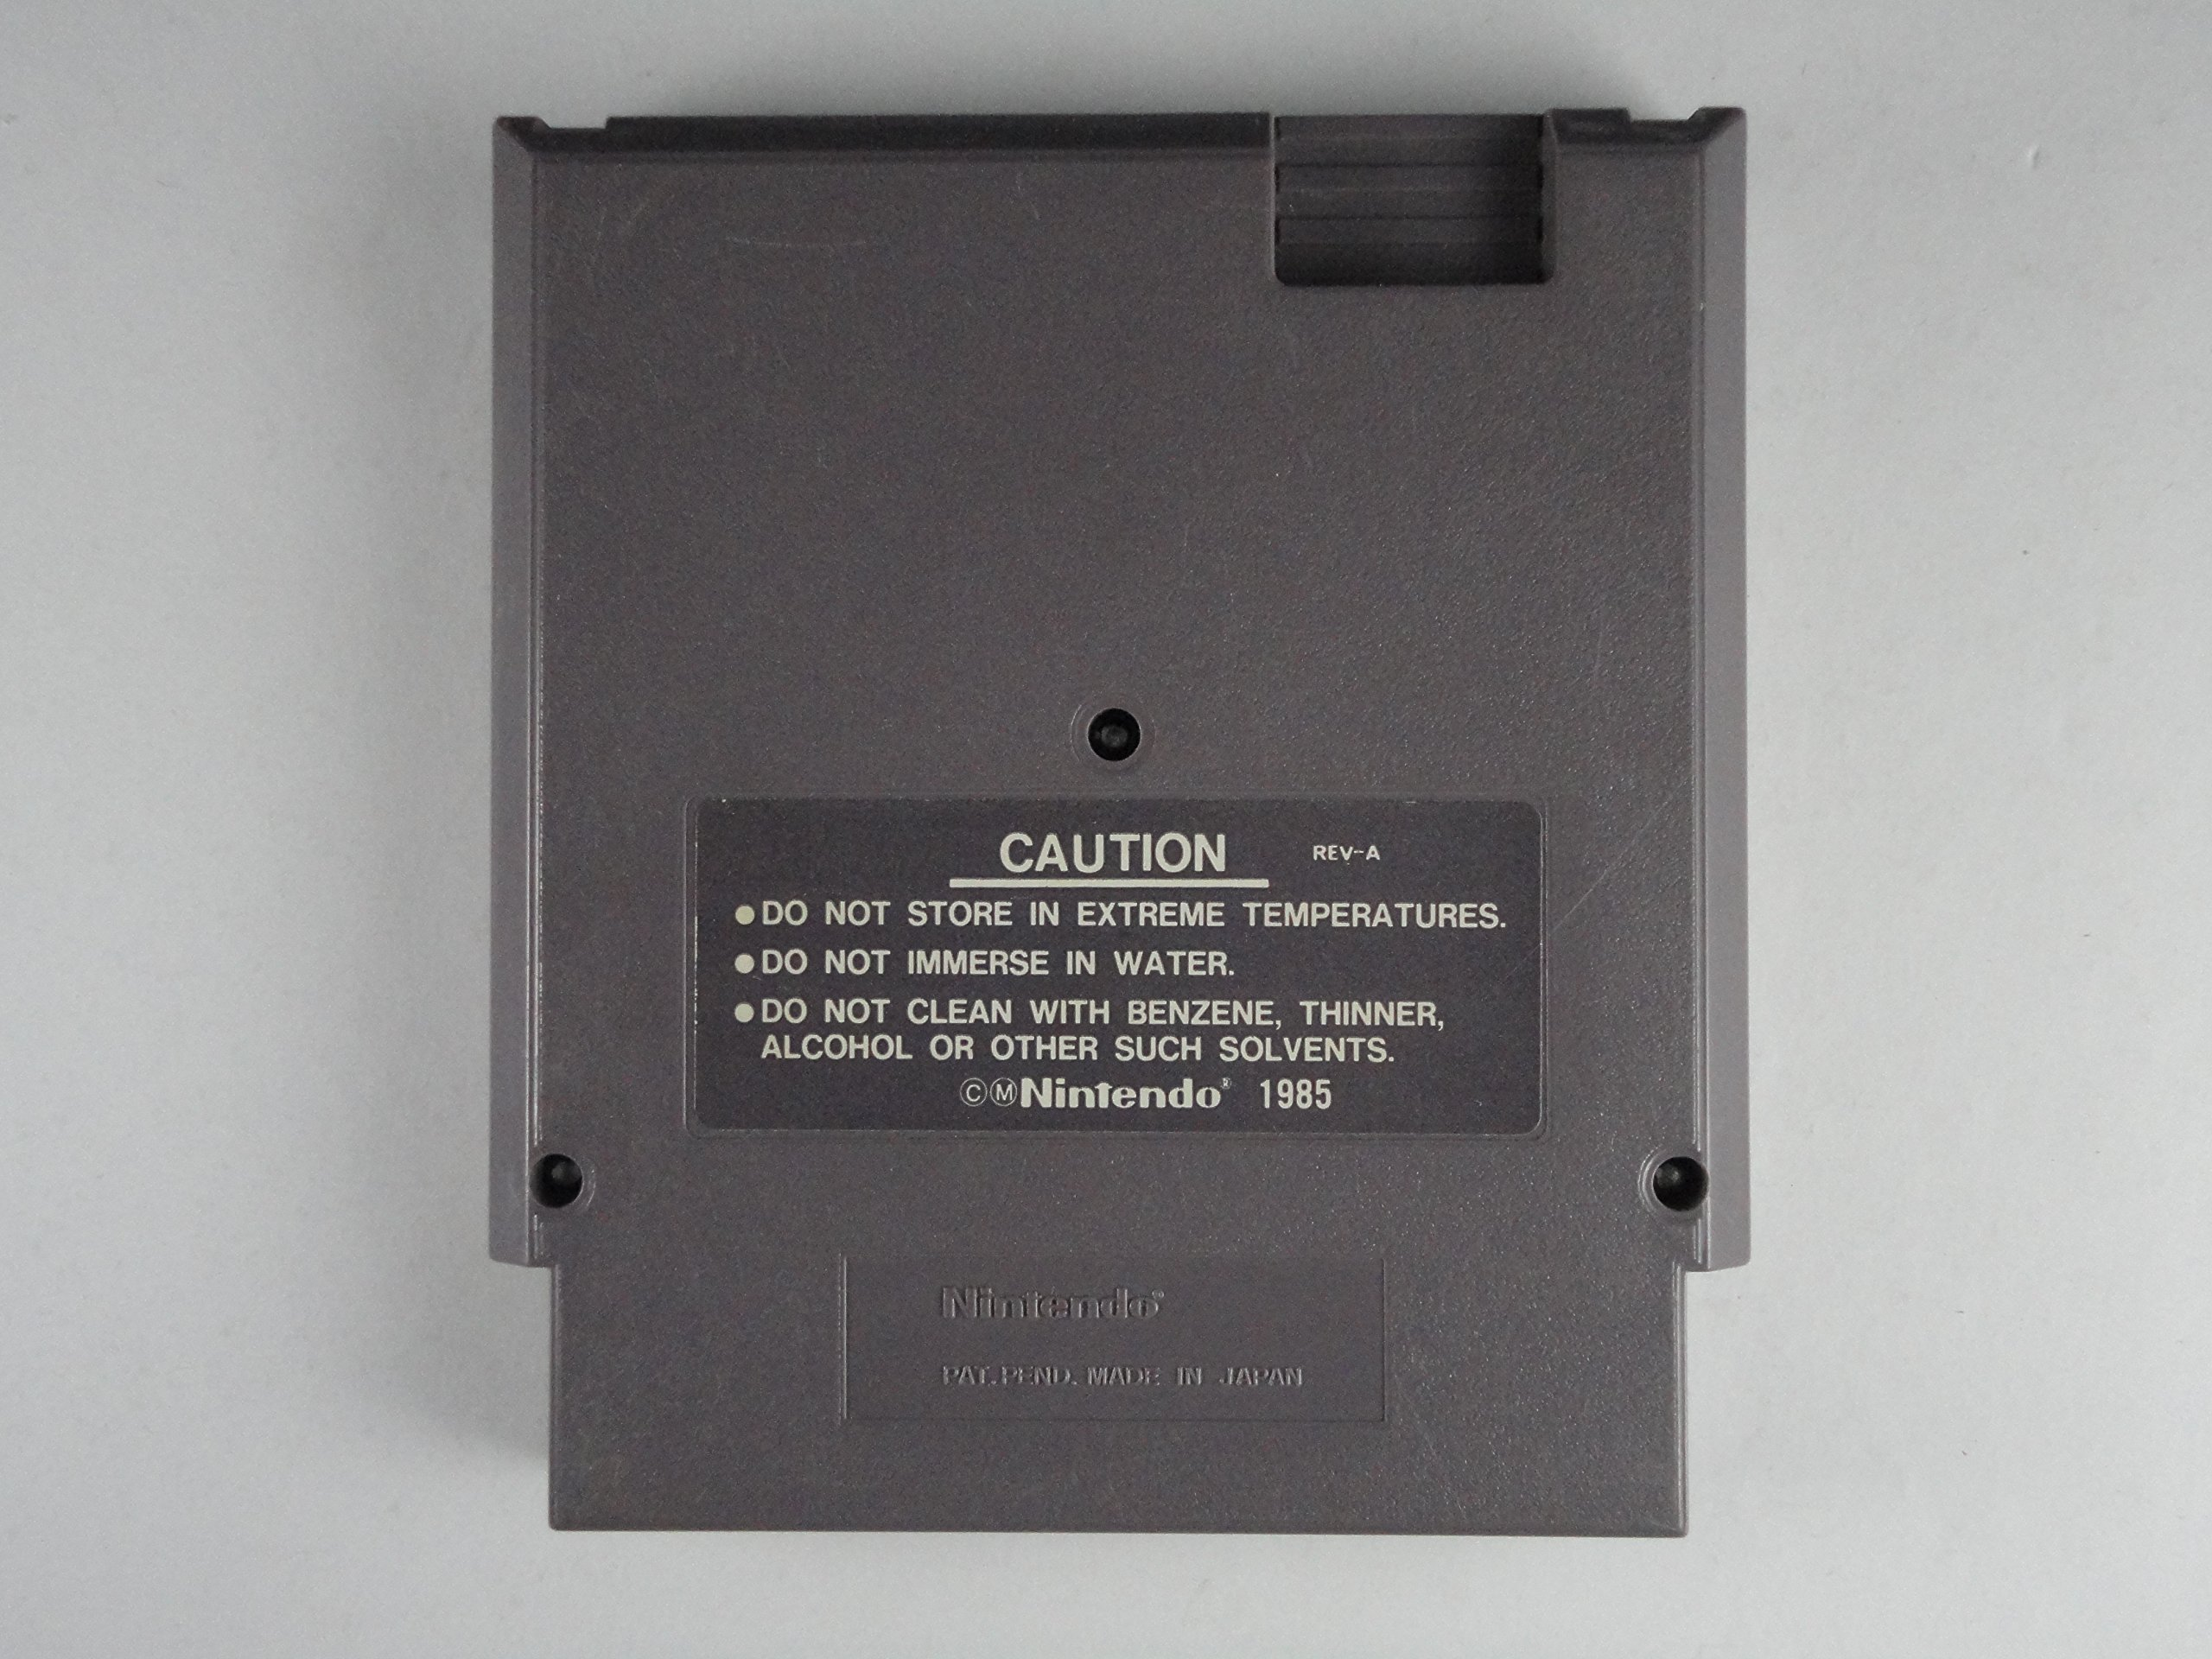 Game boy color quanto vale - Image Unavailable